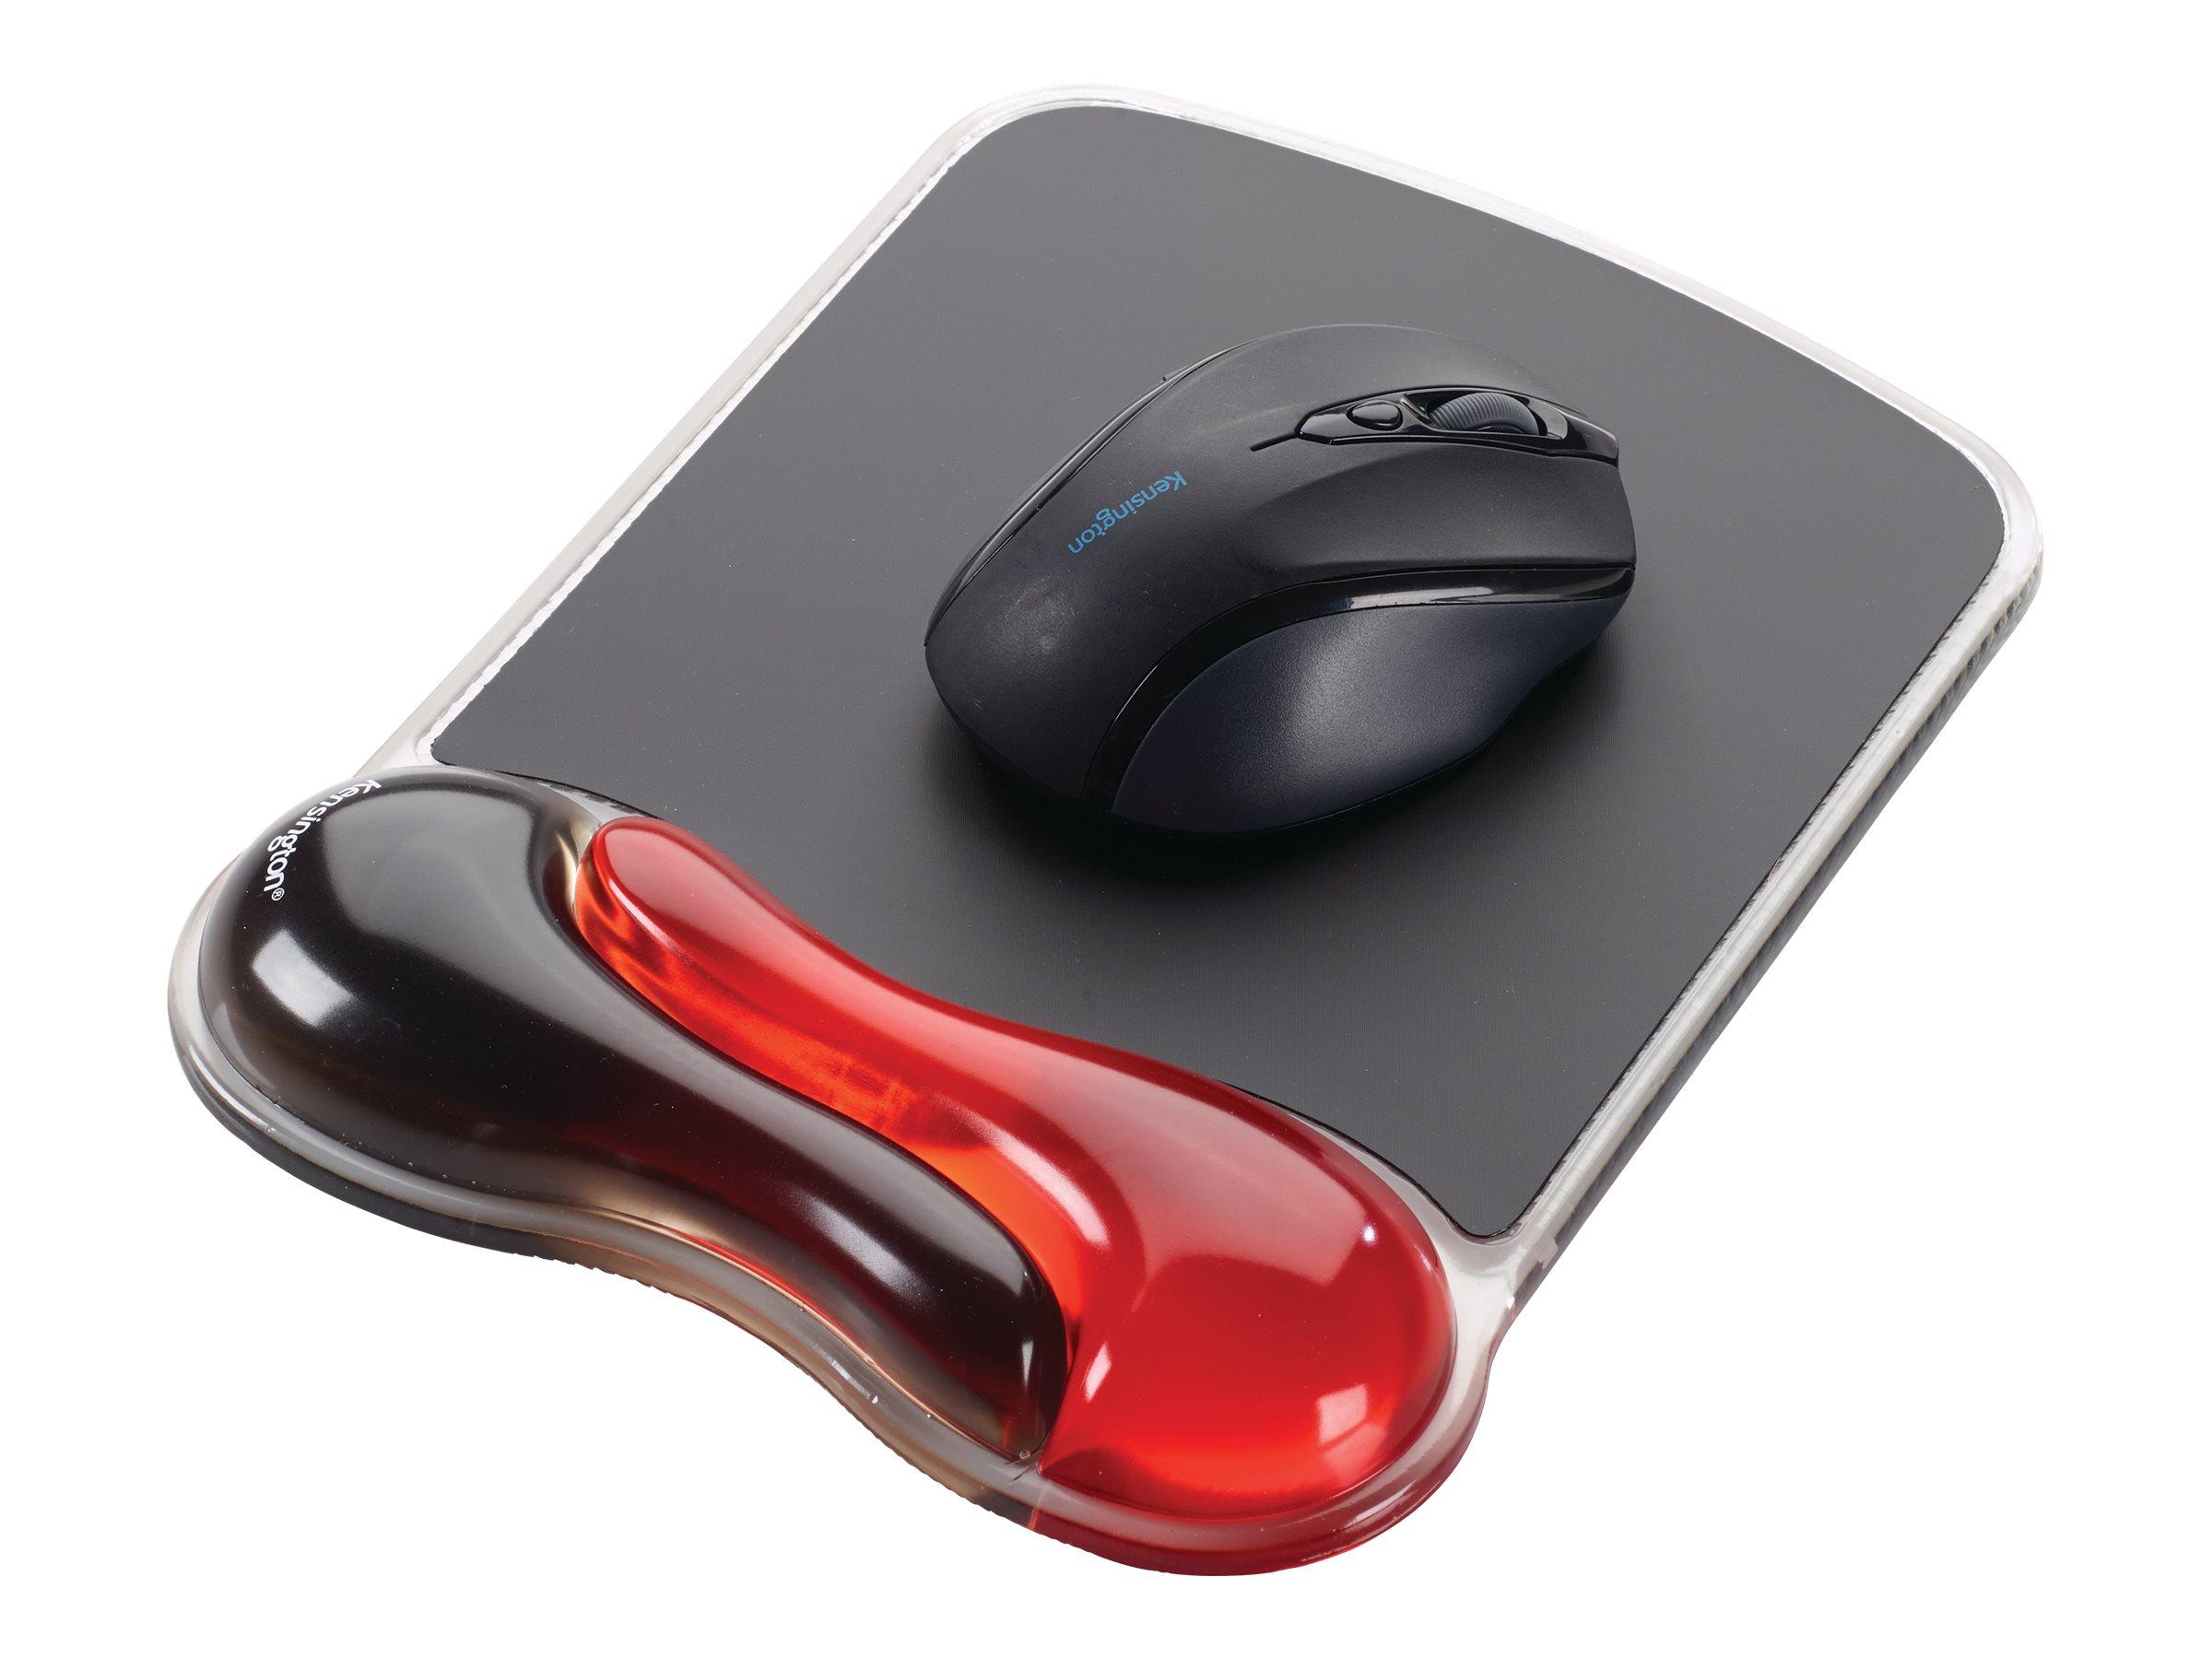 Kensington Duo Gel Wave M Wrist Rest for Mouse, Red